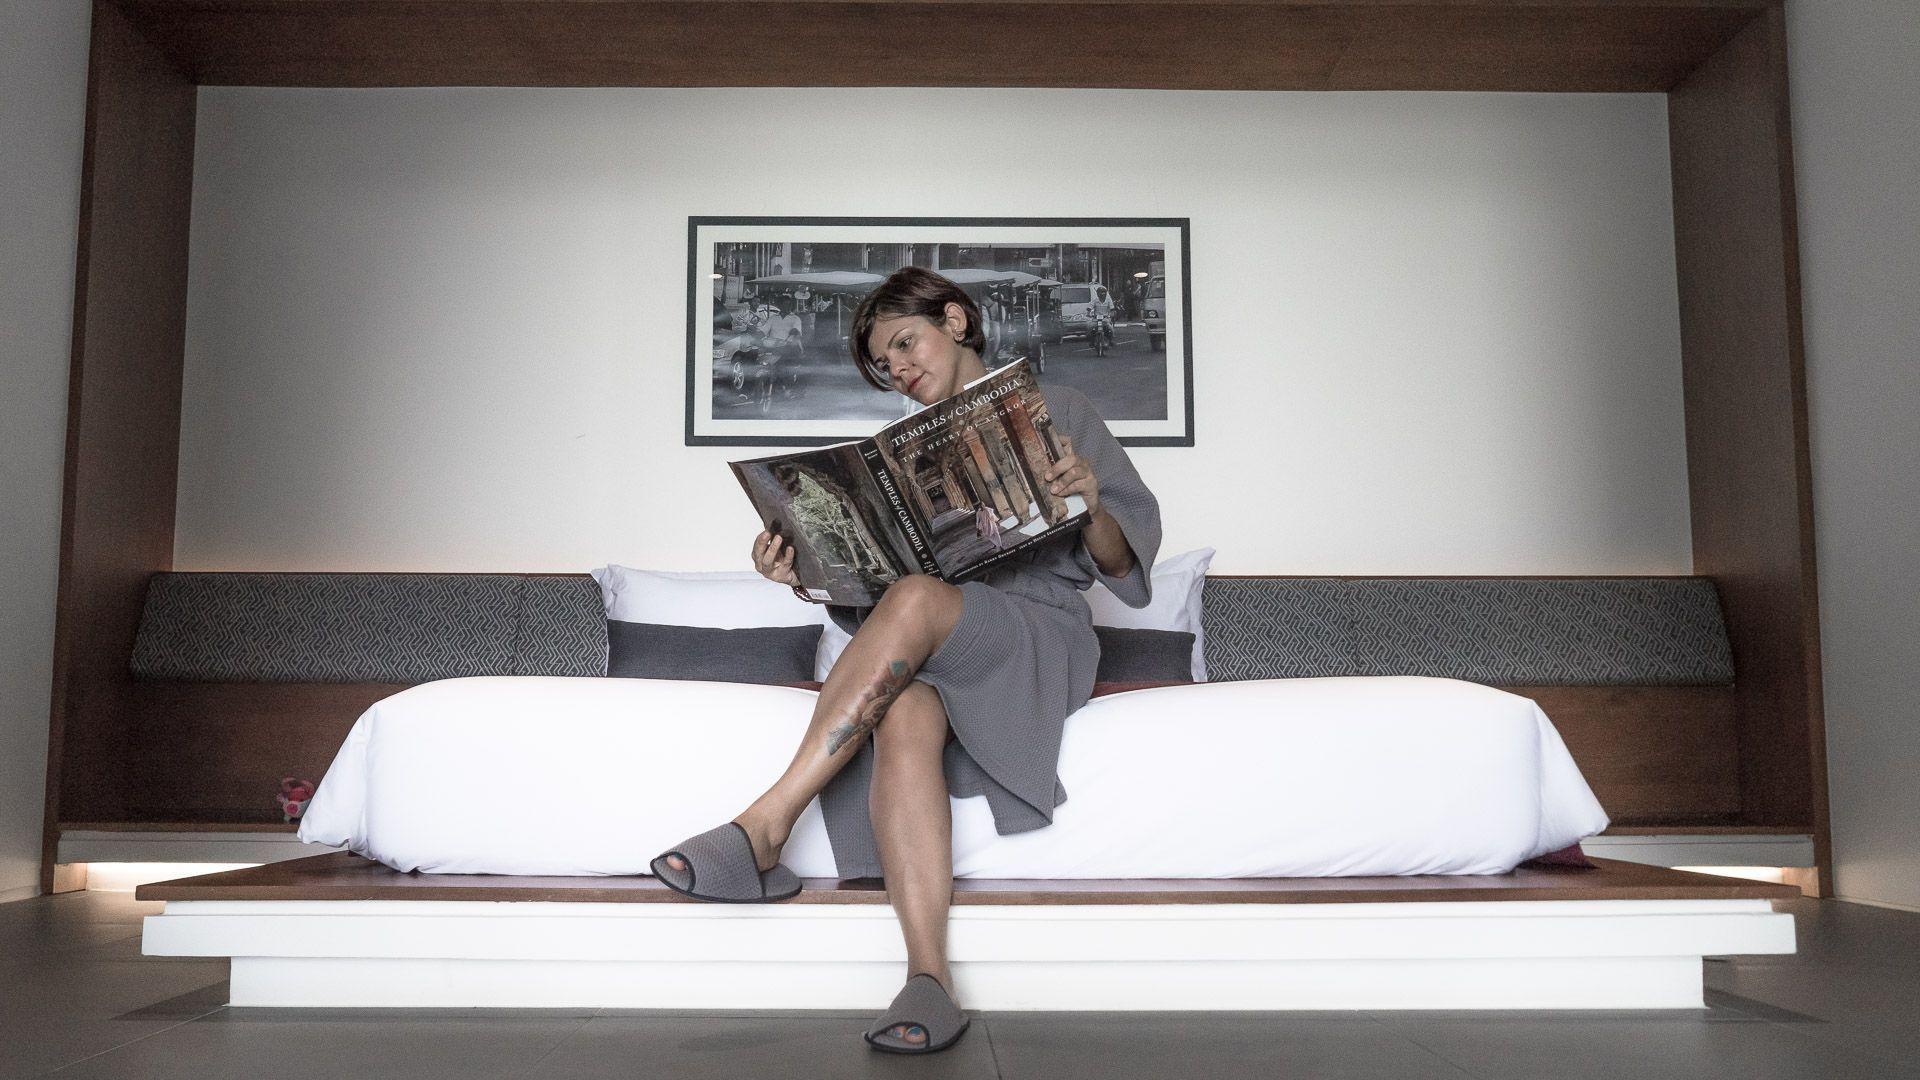 Lesvoyageuses-voyage-Phnom-Penh-cambodge-hotel-the-bale-experience-26